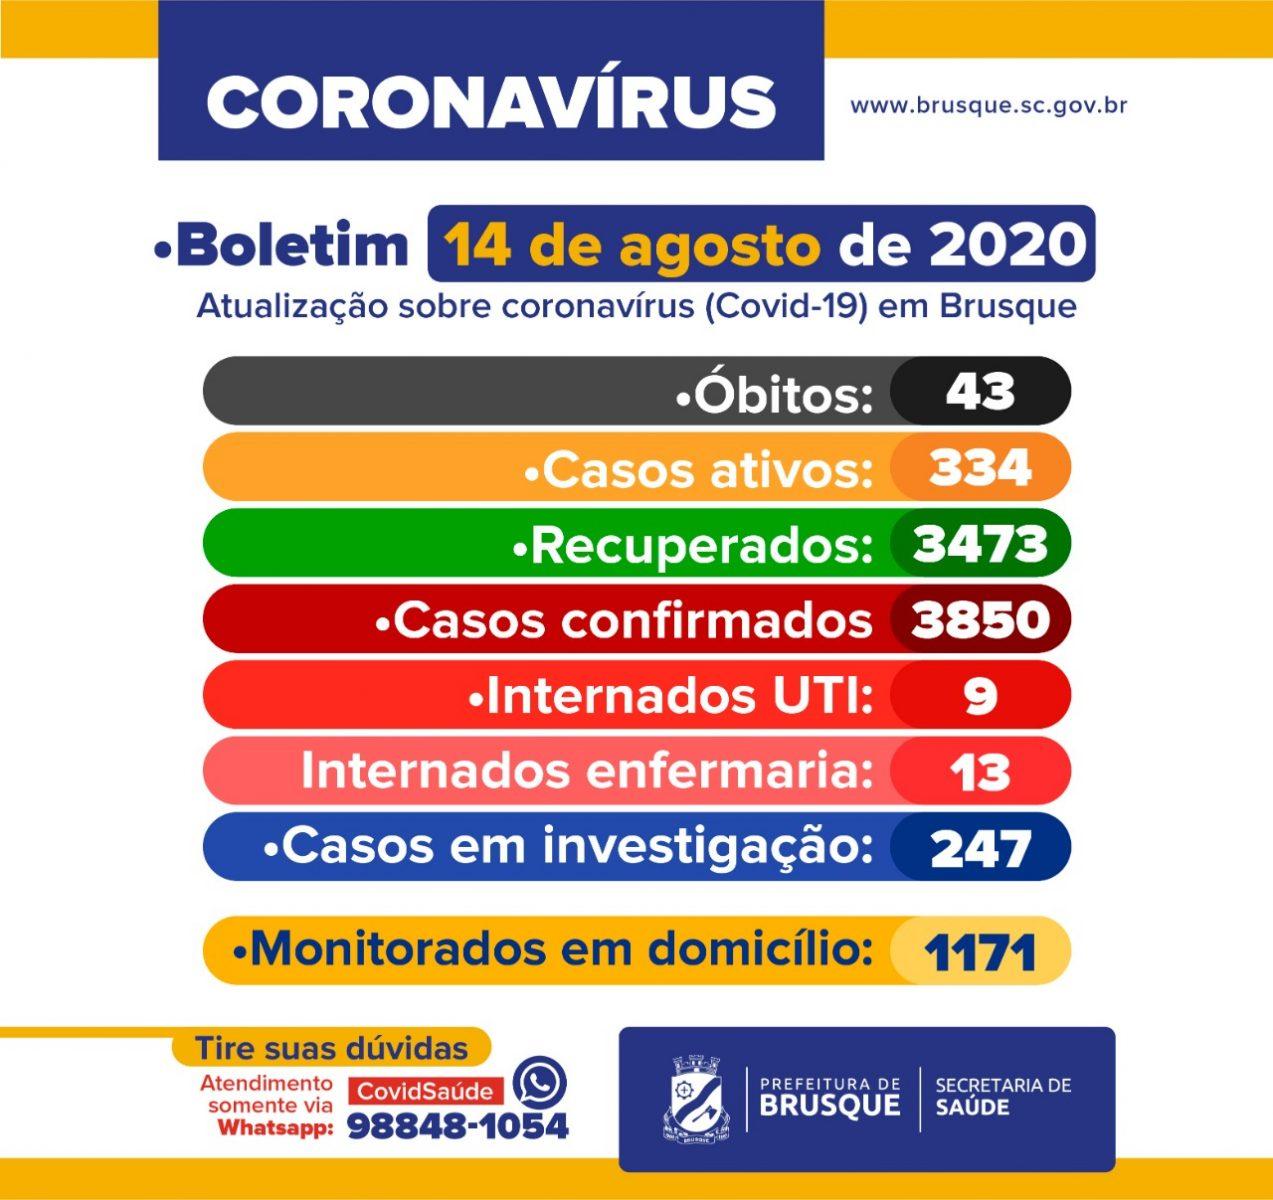 Confira o Boletim Epidemiológico da Prefeitura de Brusque desta sexta-feira (14)